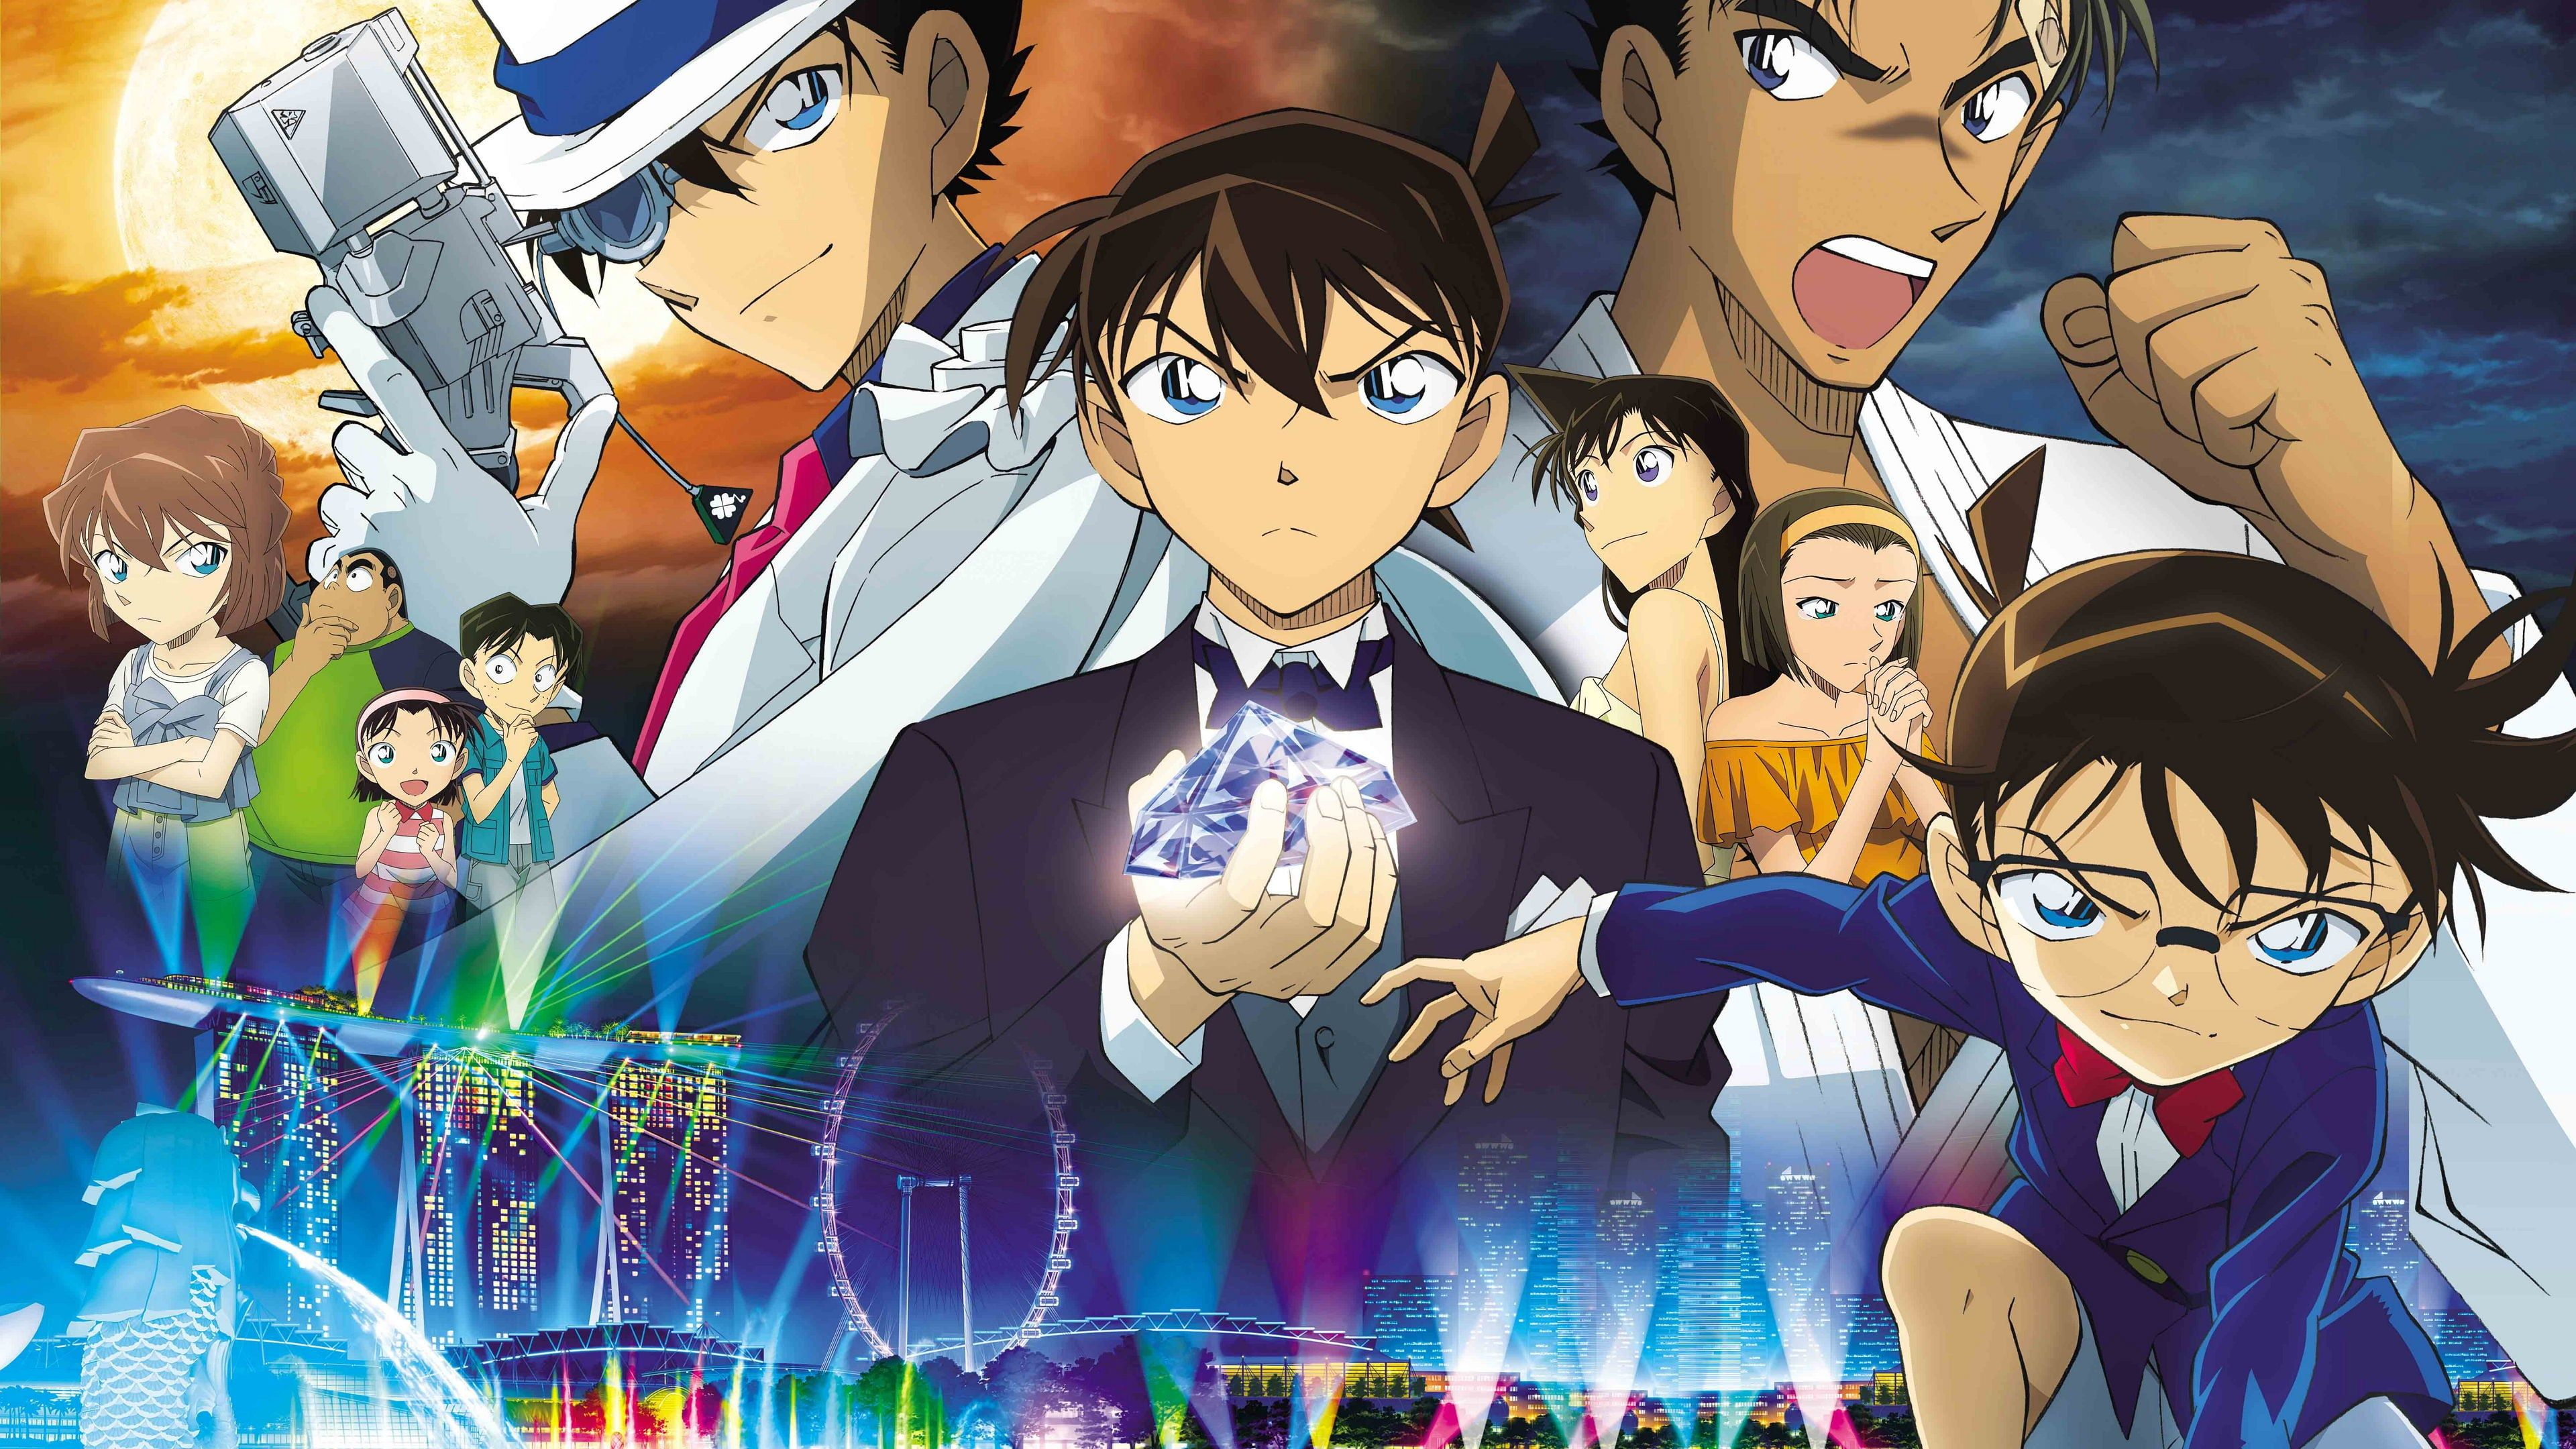 Detective Conan Fist of Blue Sapphire (Meitantei Conan